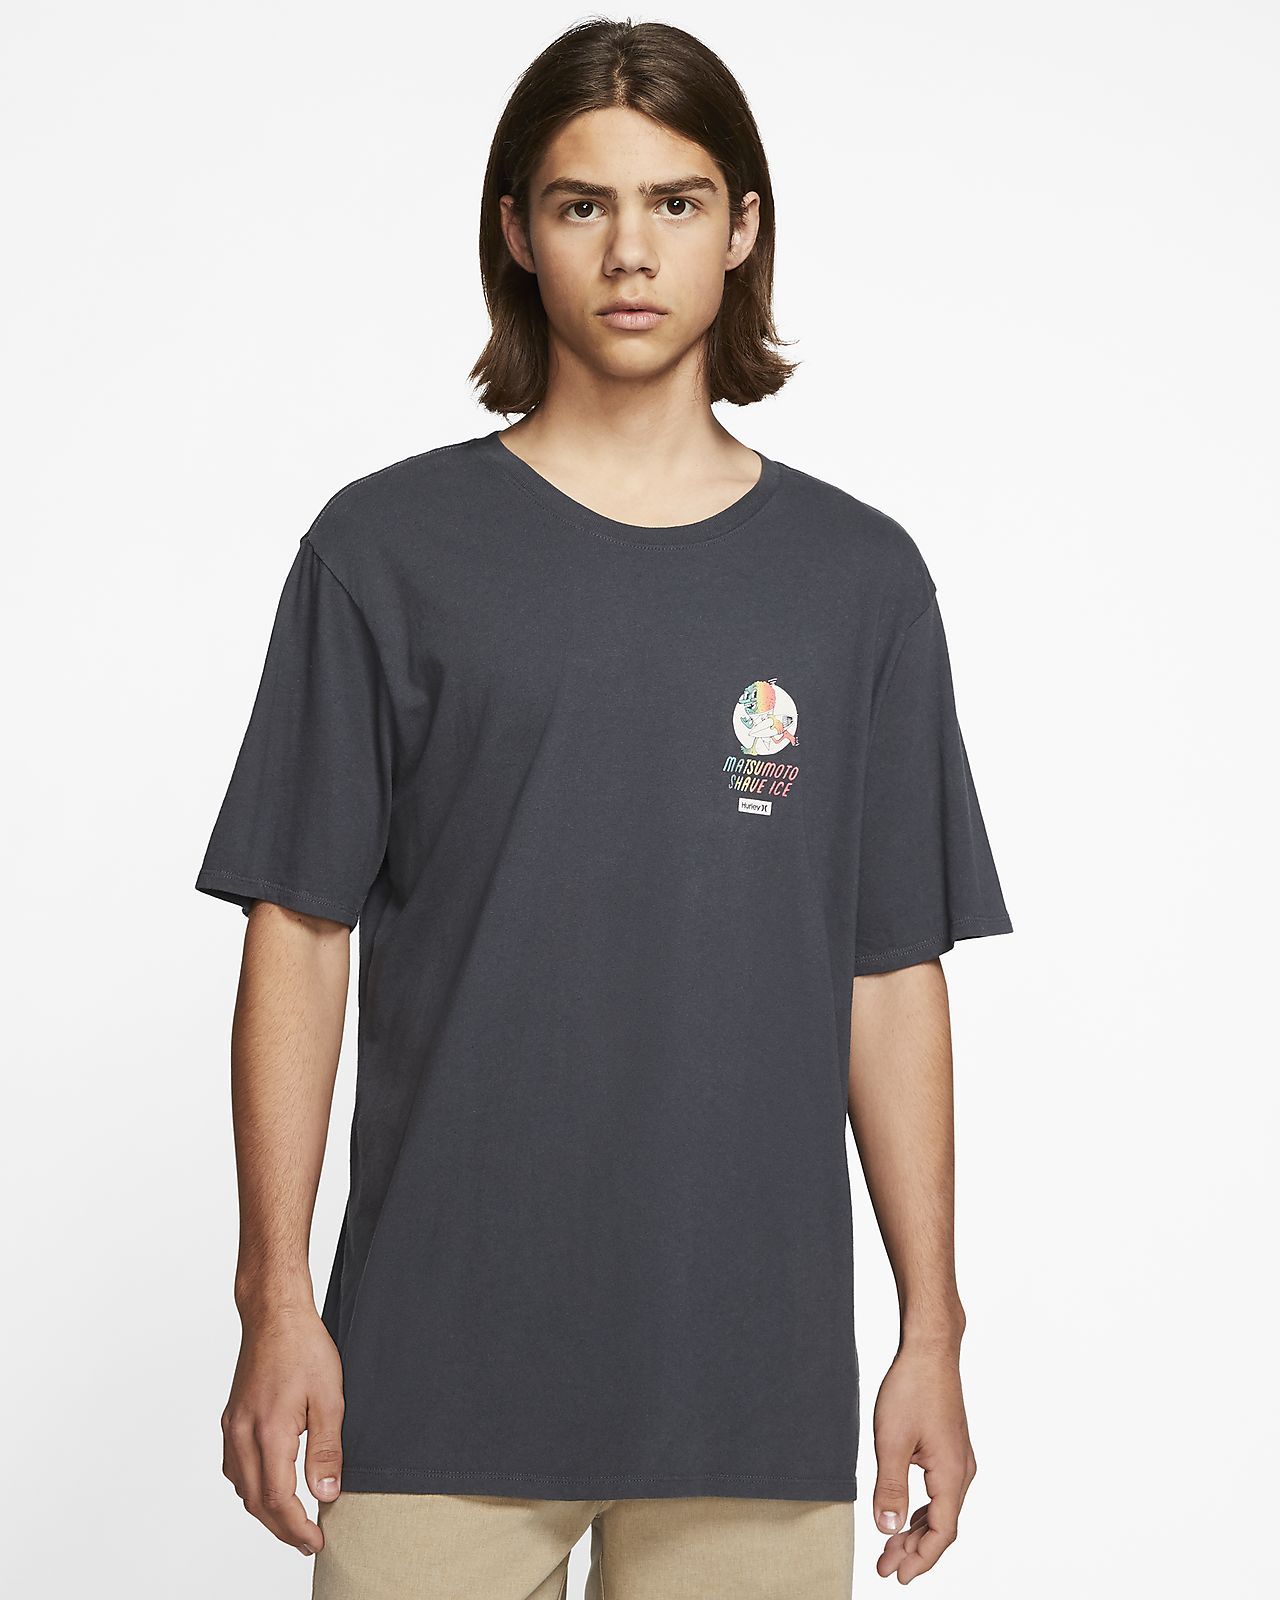 Pánské tričko Hurley x Matsumoto Shave Ice